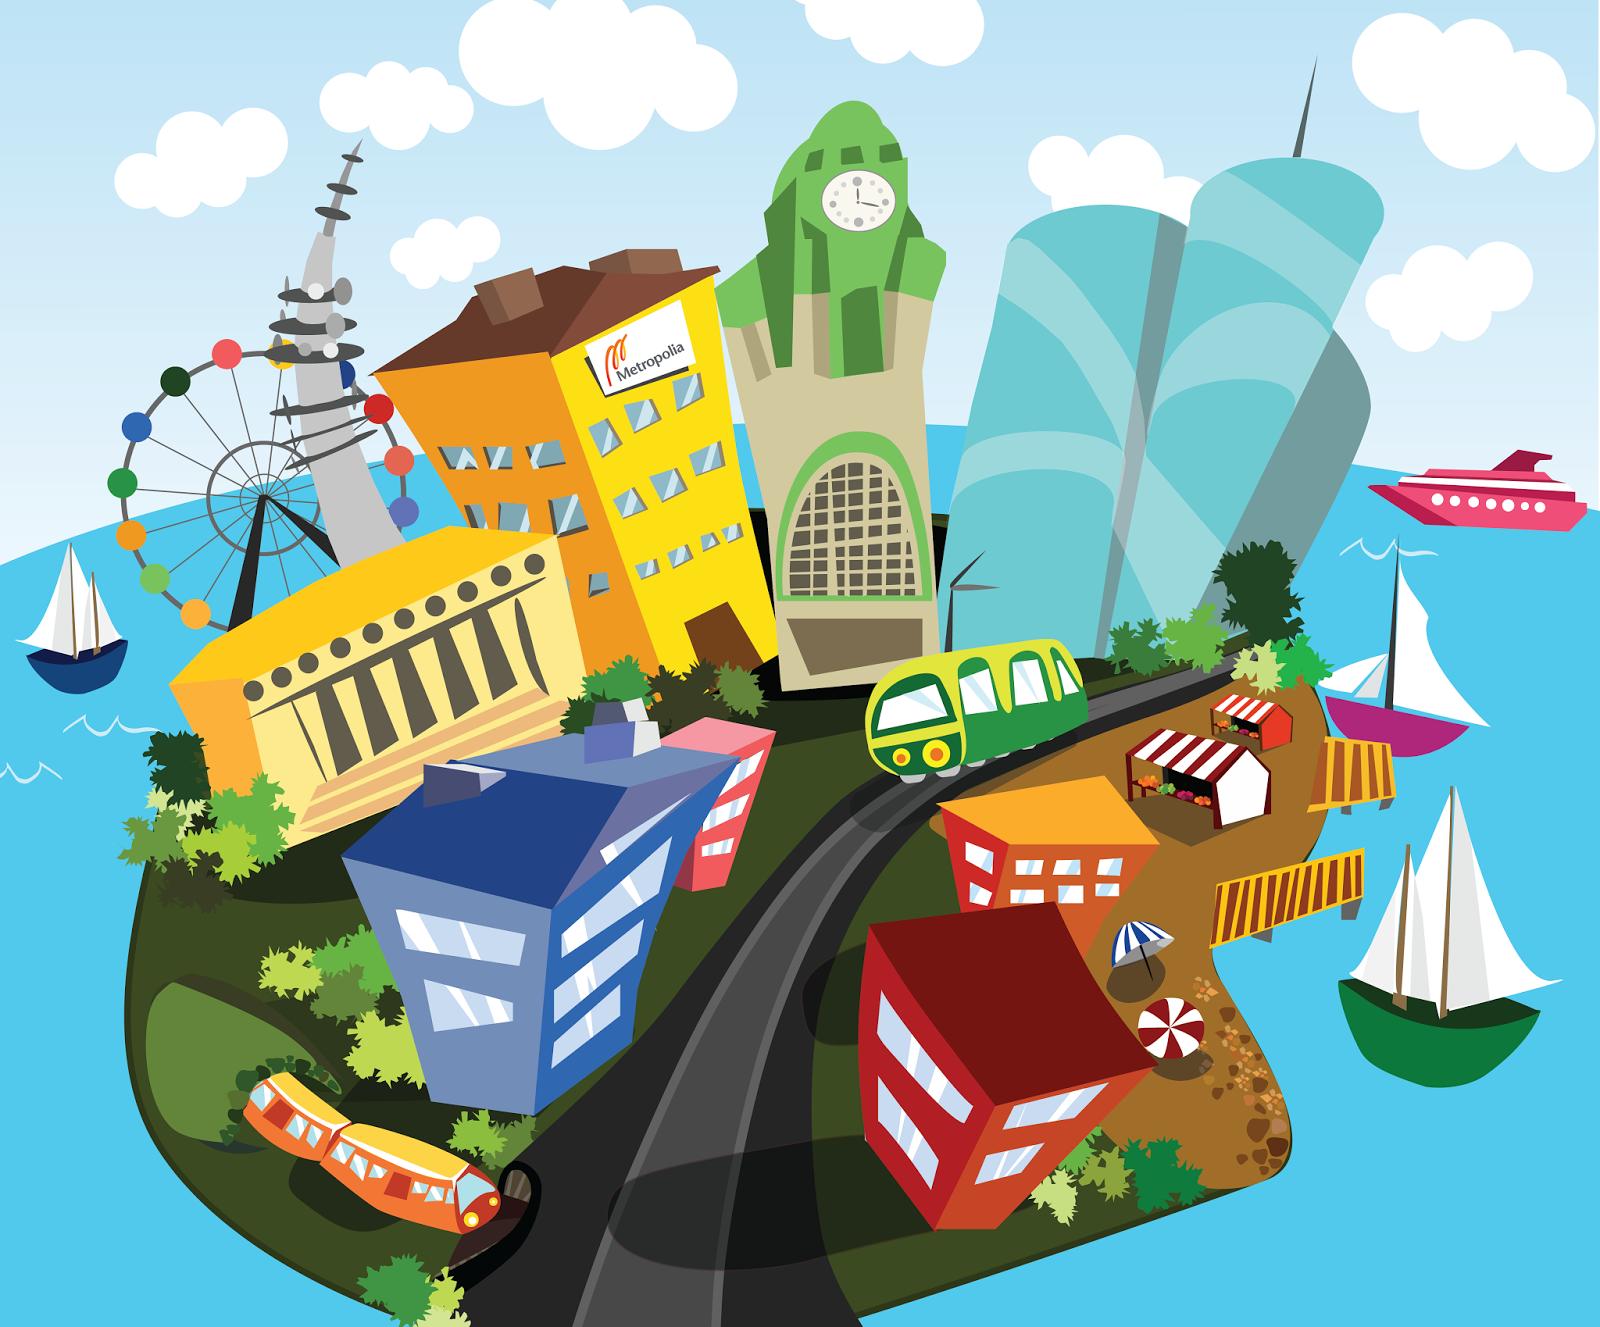 prezi background road illustration design items on